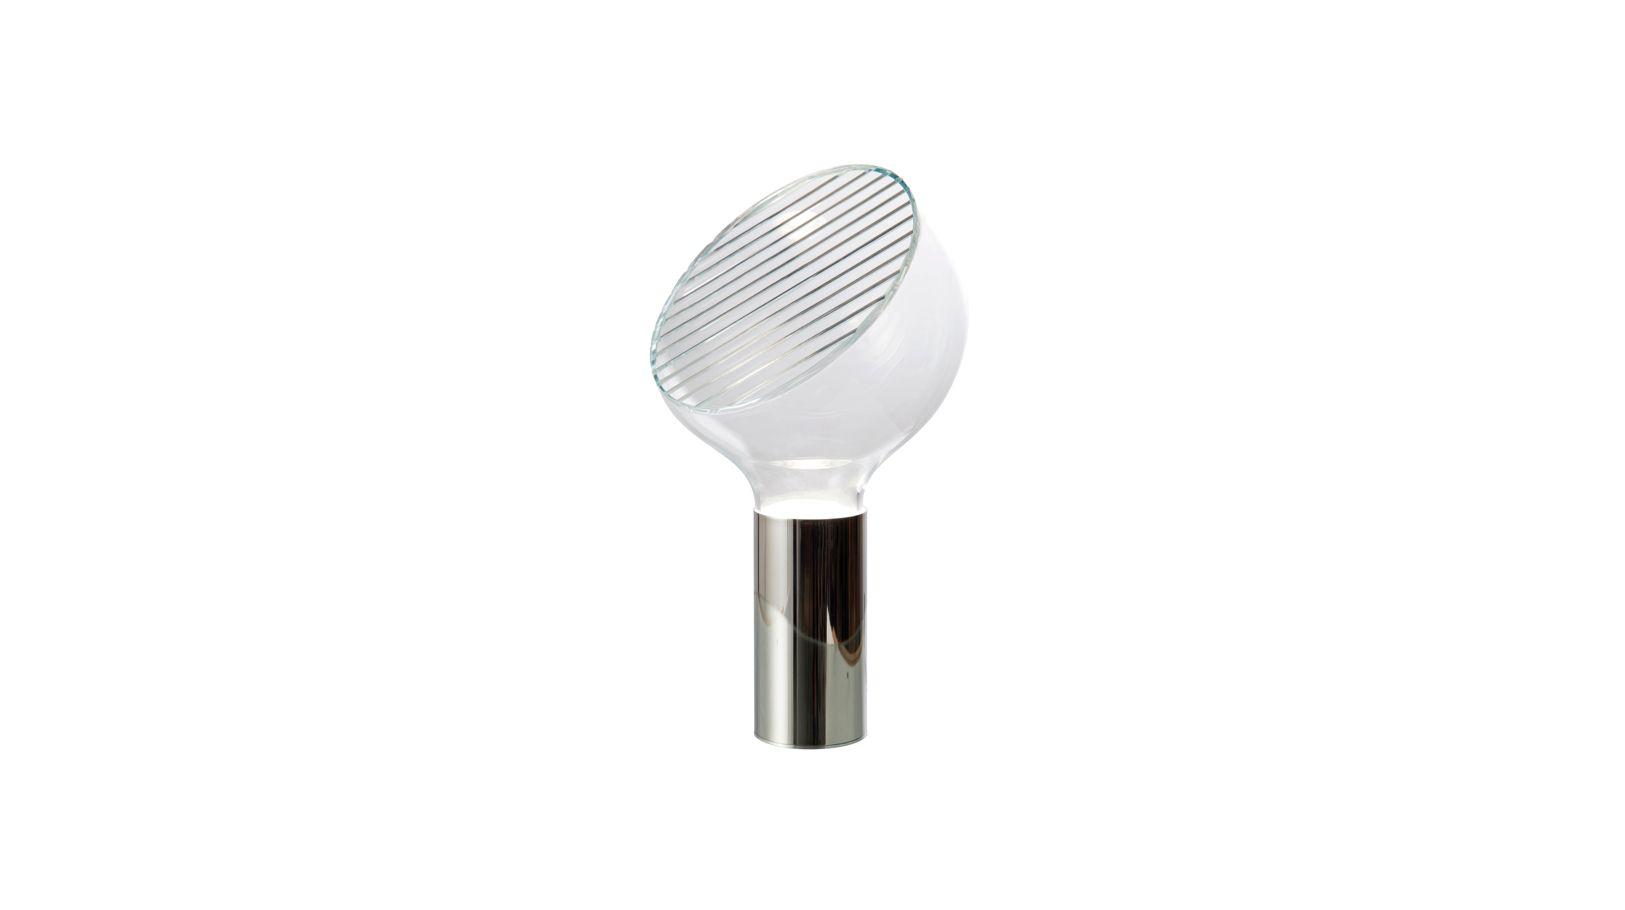 bulb lampe poser roche bobois. Black Bedroom Furniture Sets. Home Design Ideas